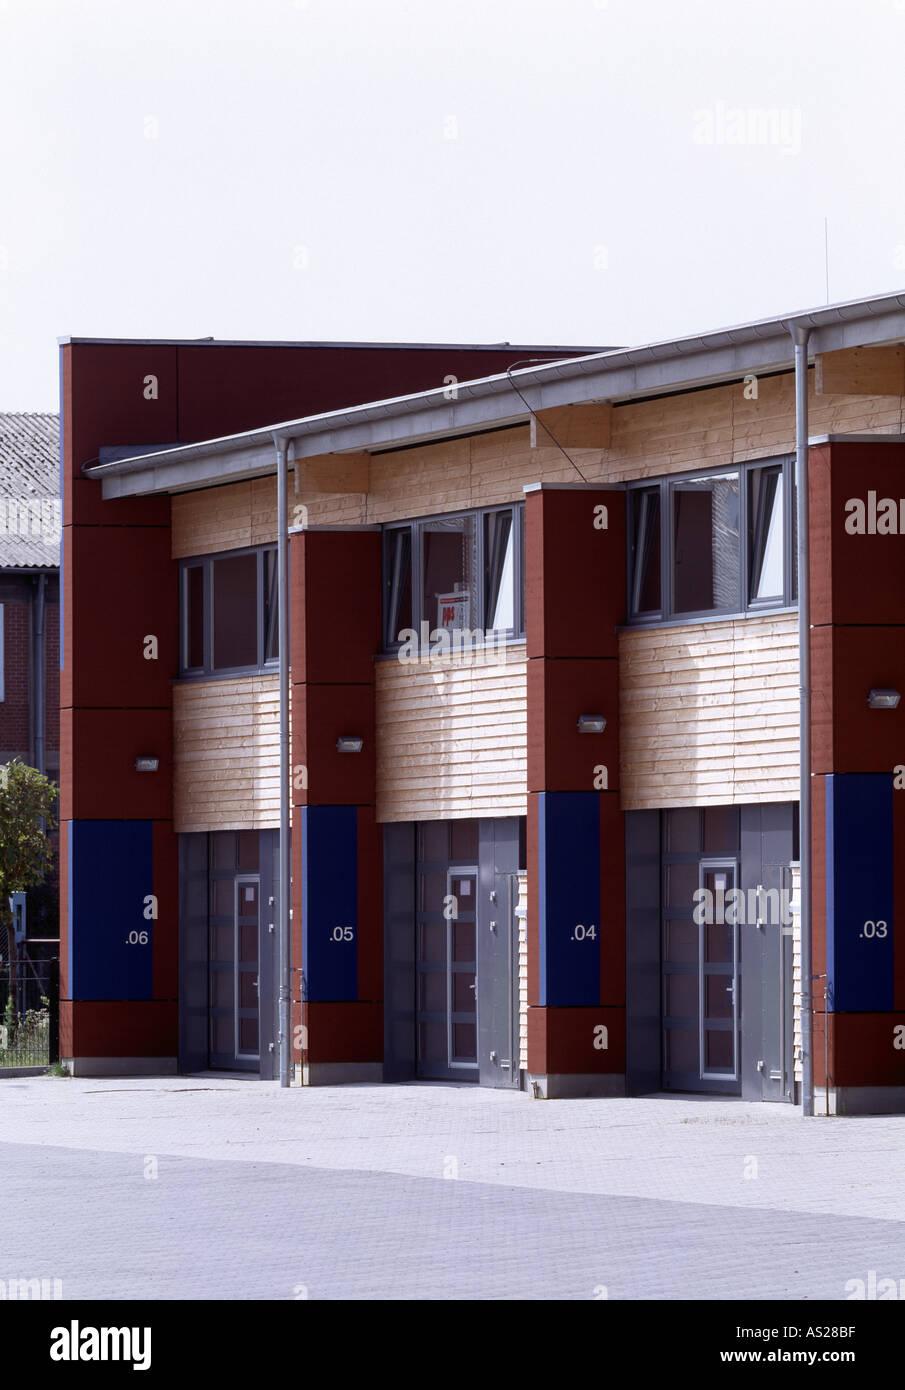 Architekten Bremerhaven architekten bremerhaven hausdesign pro